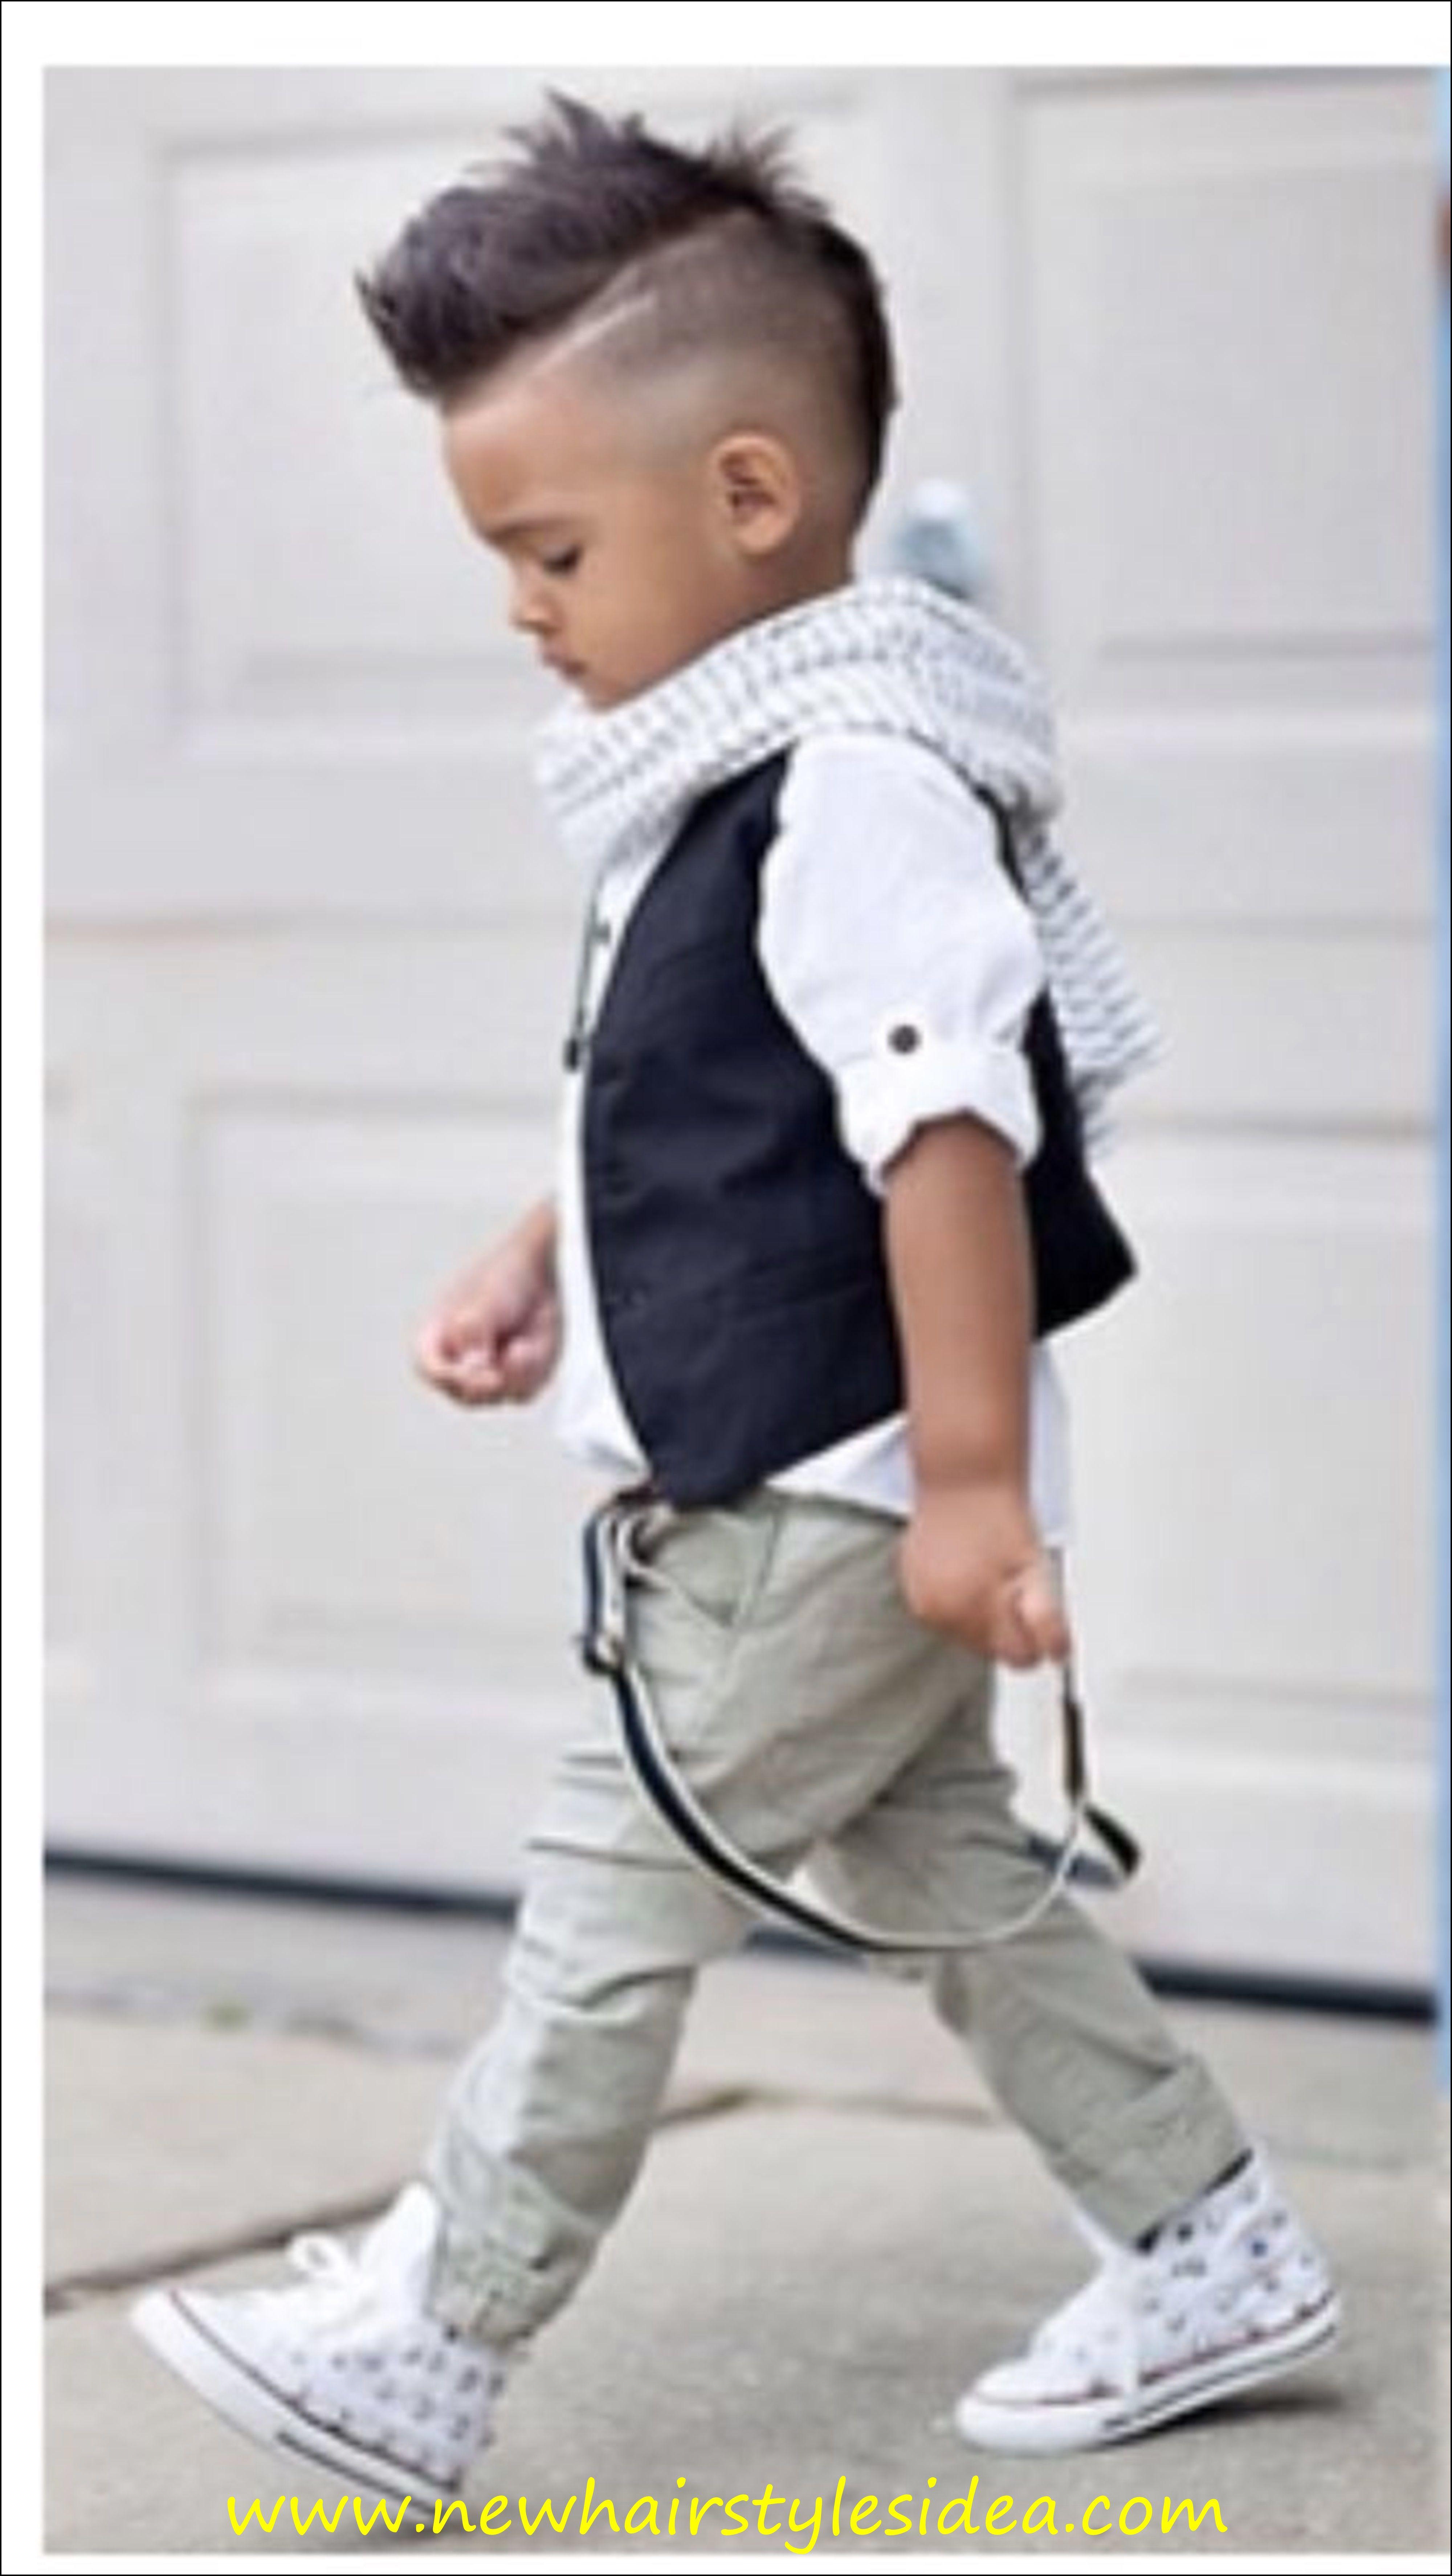 Black Boy Haircut   New Hairstyles Idea  New In Baby Boy - Haircut missoula